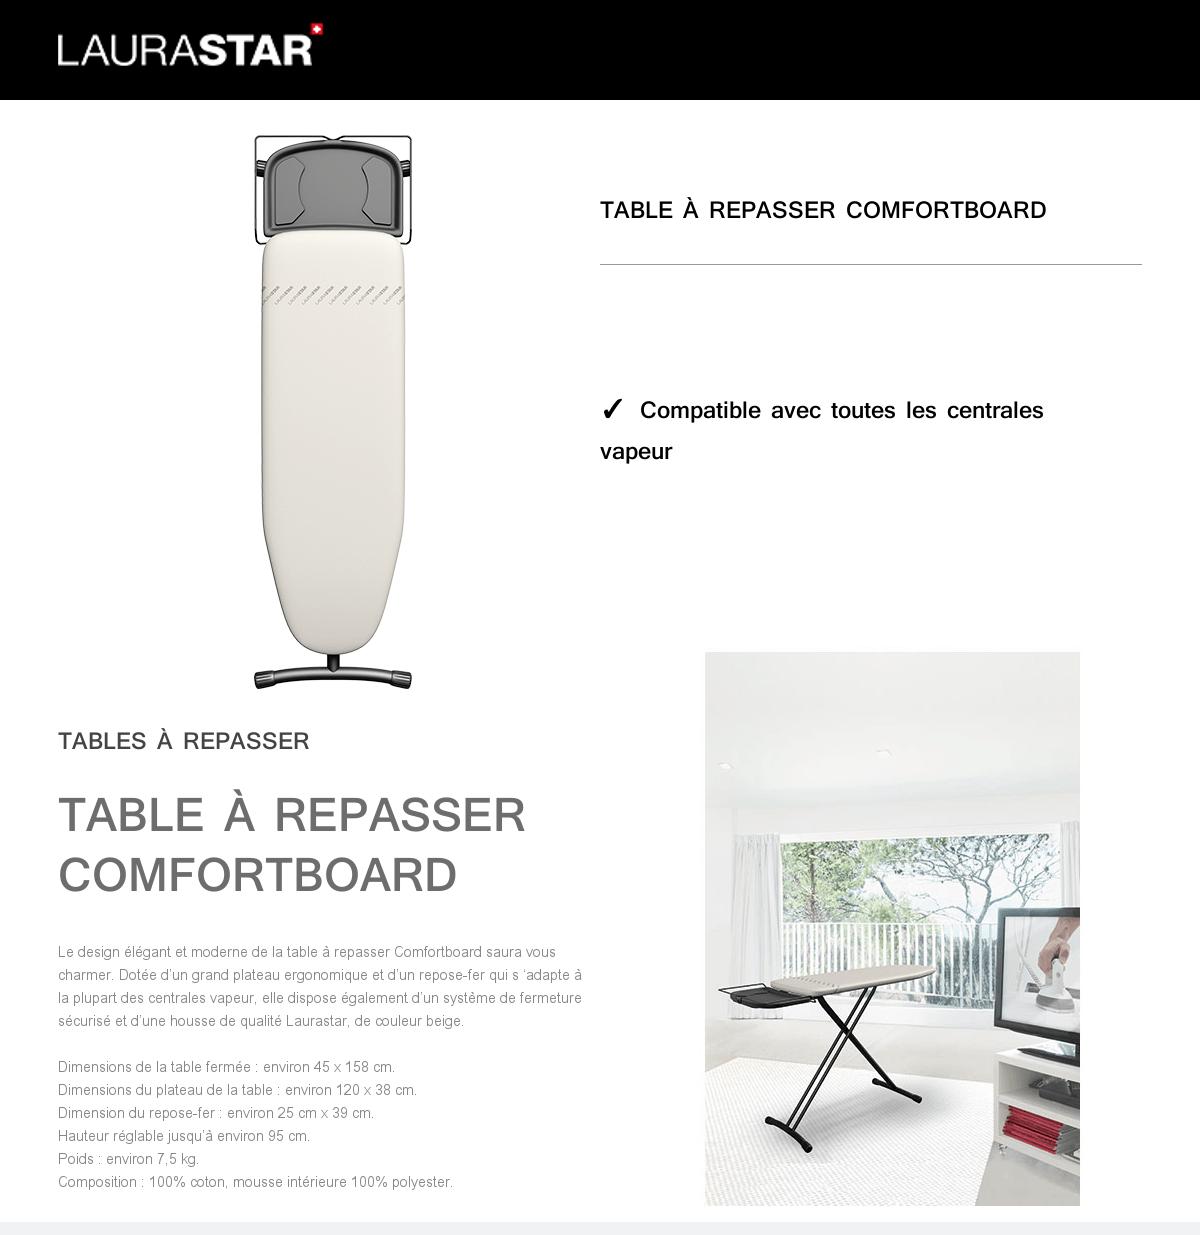 Laurastar Table A Repasser Comfortboard Beige Achat Vente